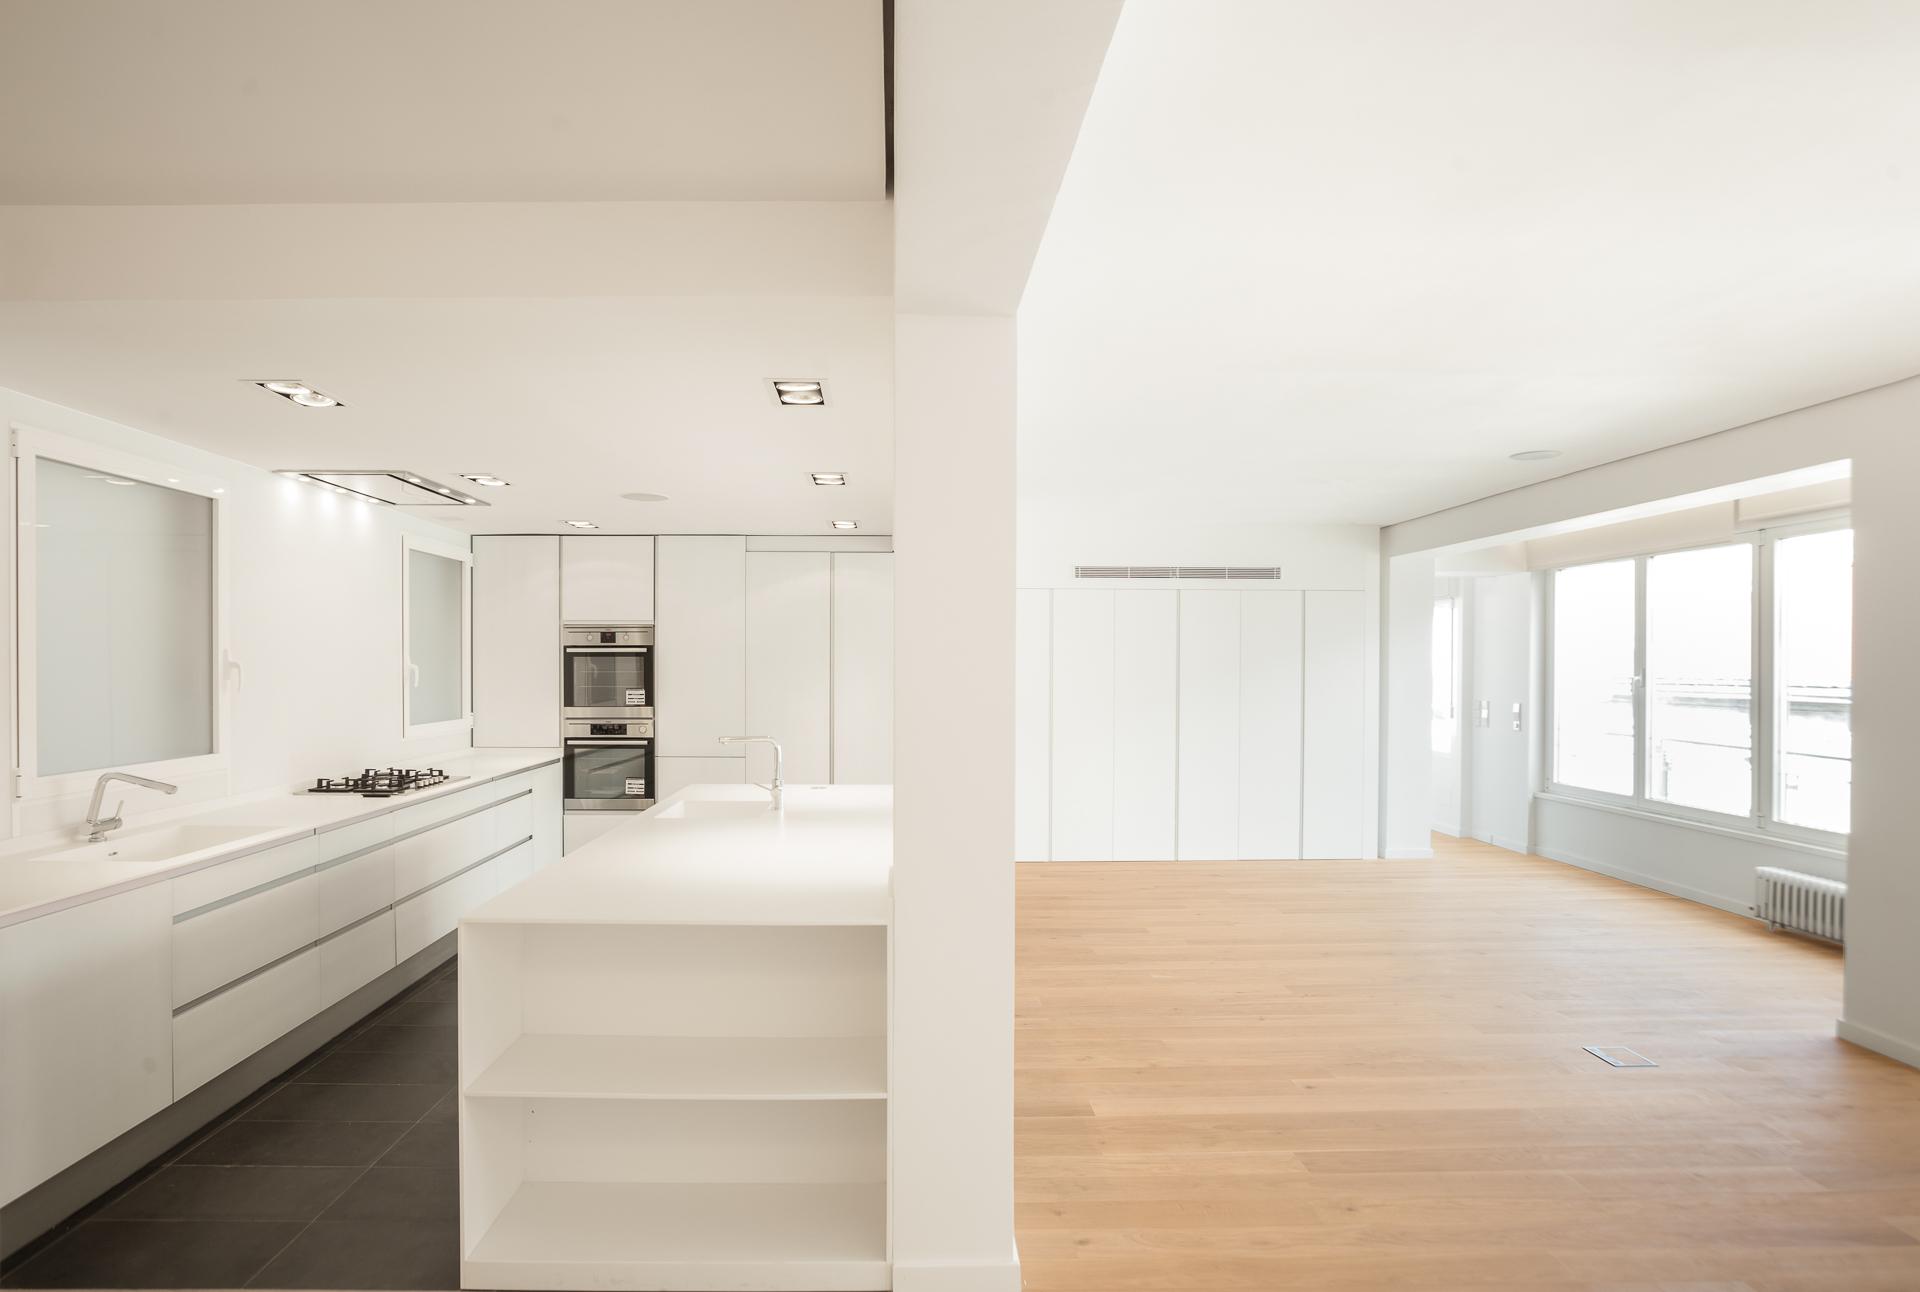 LAGASCA_Maroto_Ibañez_arquitectos03